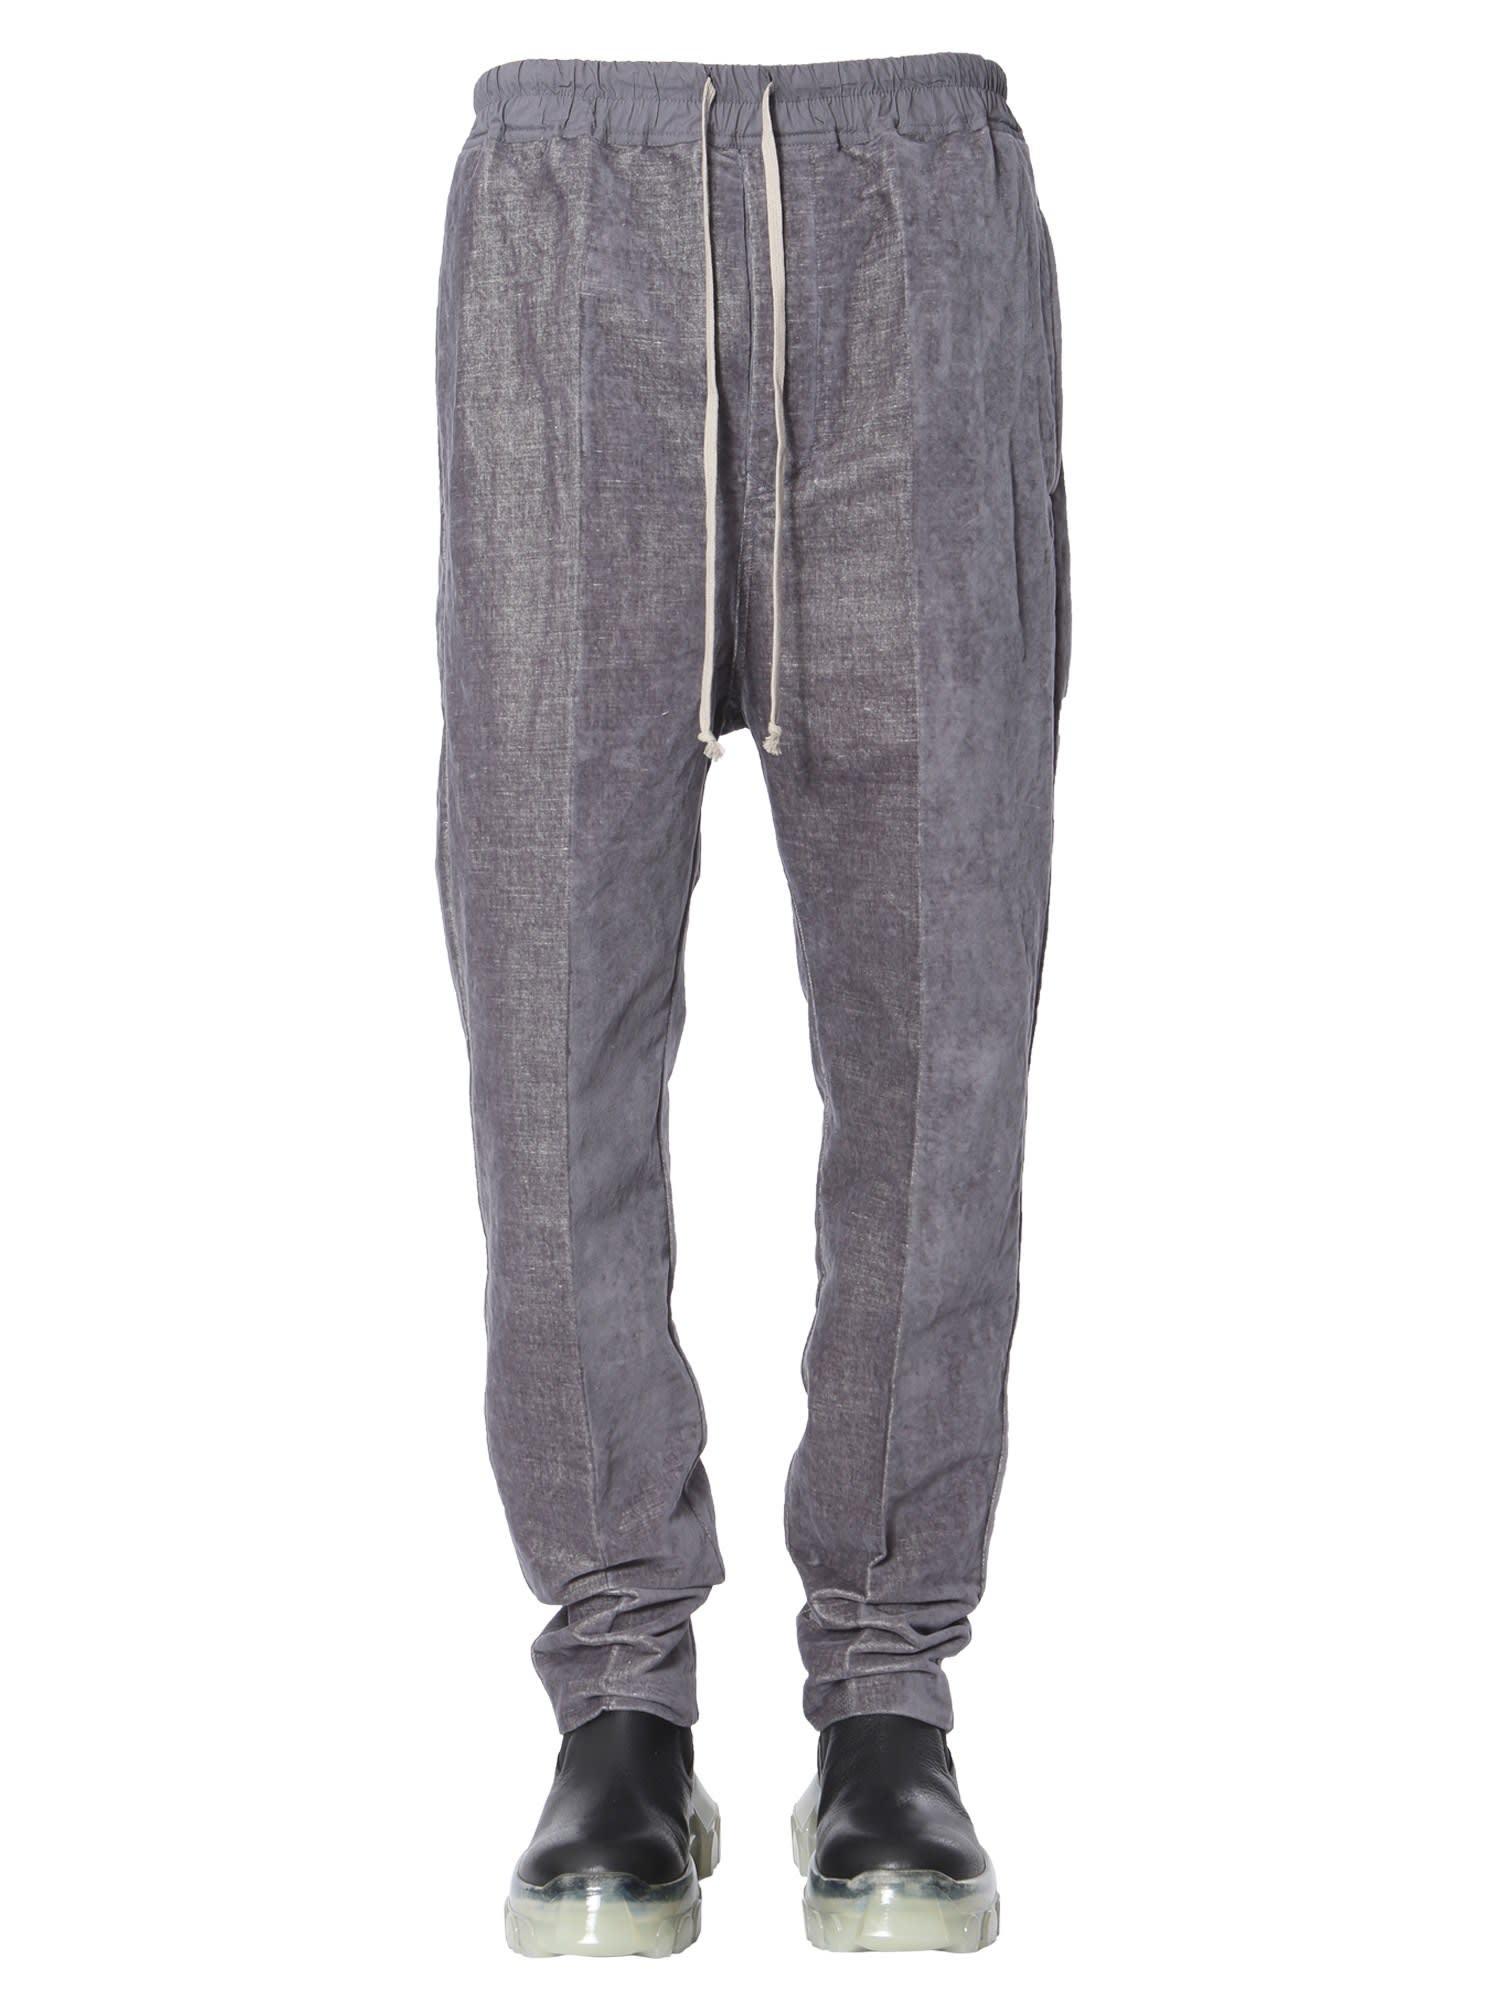 Rick Owens Velvet Pants